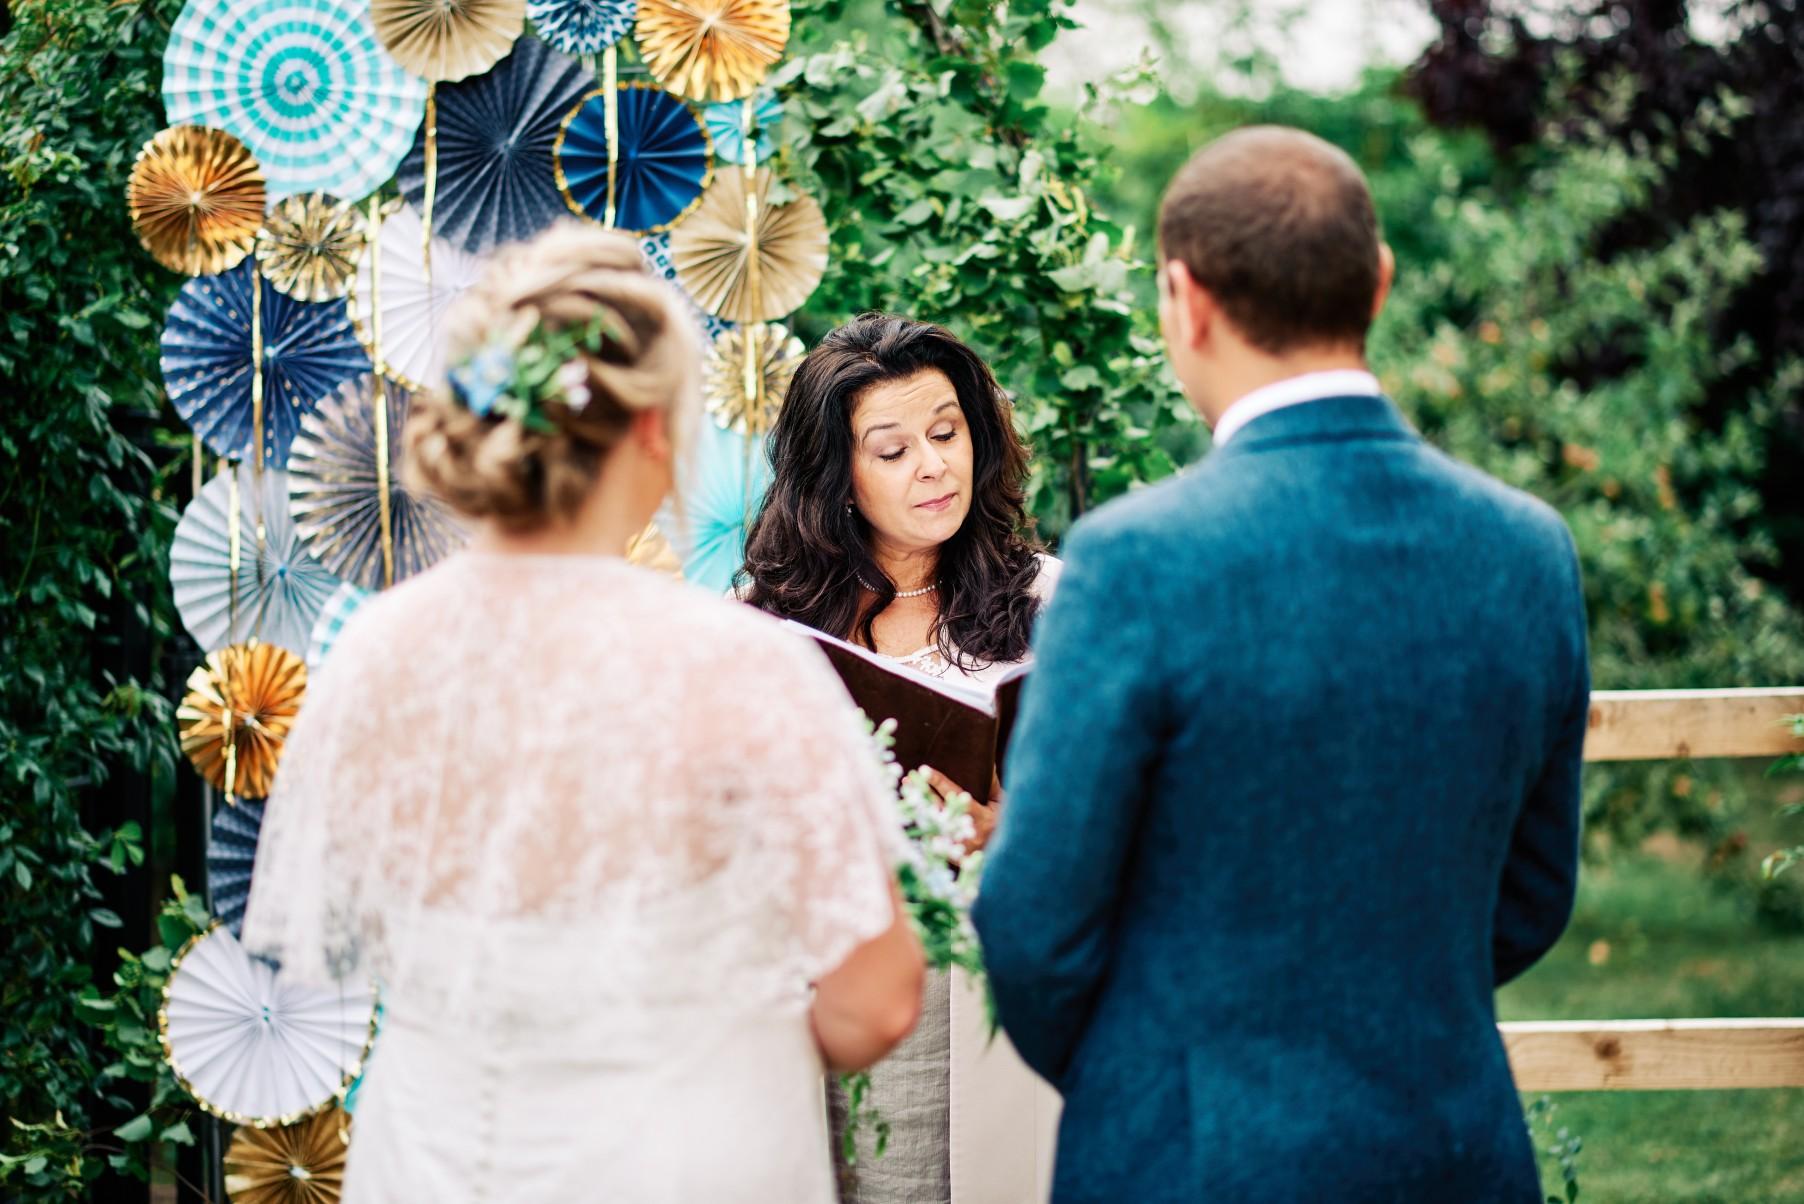 nhs wedding - paramedic wedding - blue and gold wedding - outdoor wedding - micro wedding - surprise wedding - celebrant wedding